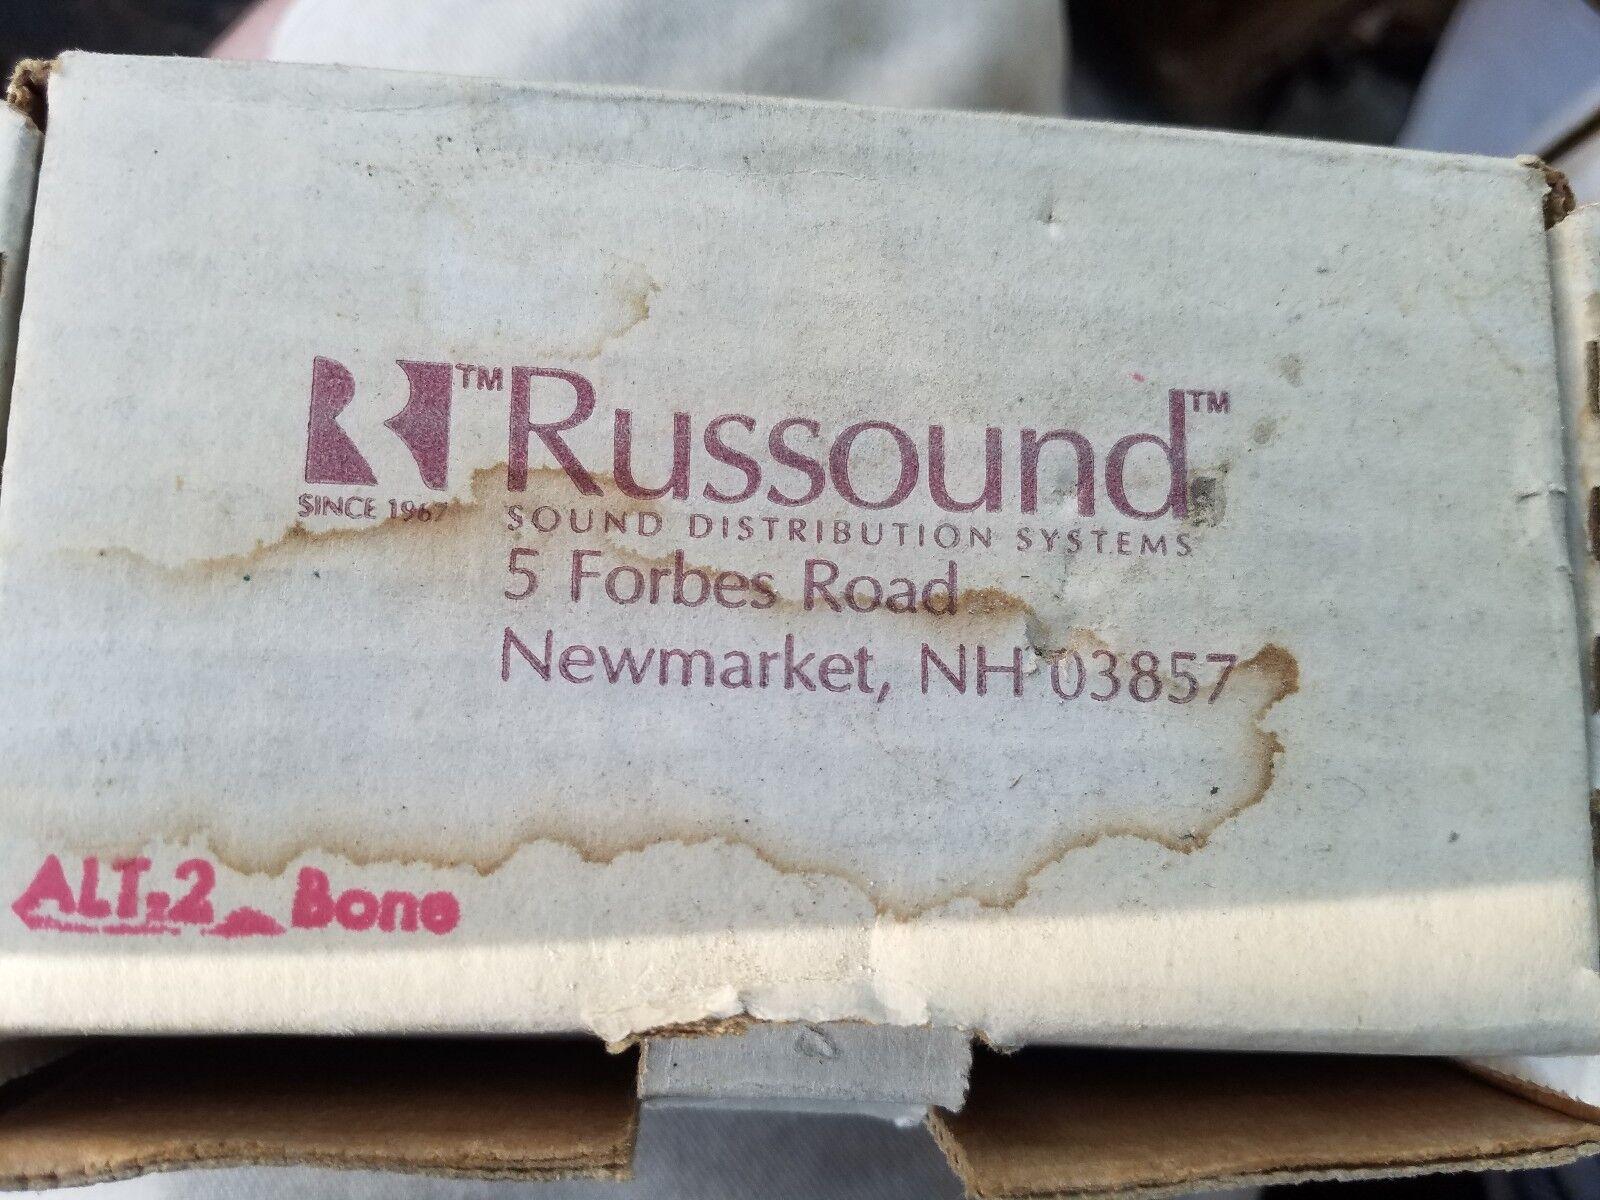 RUSSOUND ALT-2  BONE, 126 STEREO WALL MOUNT VOLUME CONTROL-NEW